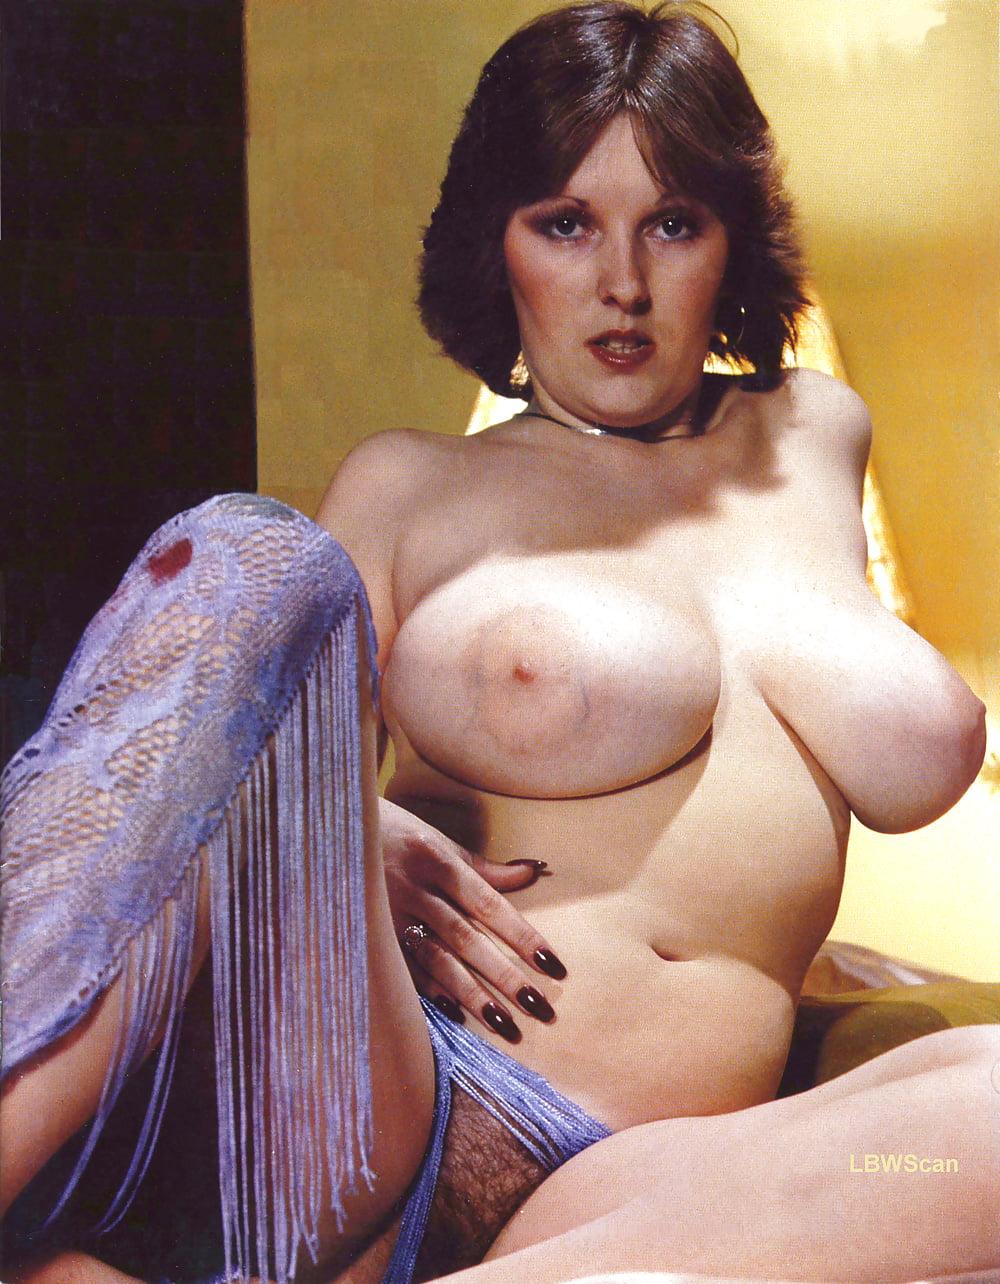 Nude busty hot vintage pornstar girls fake pics brown